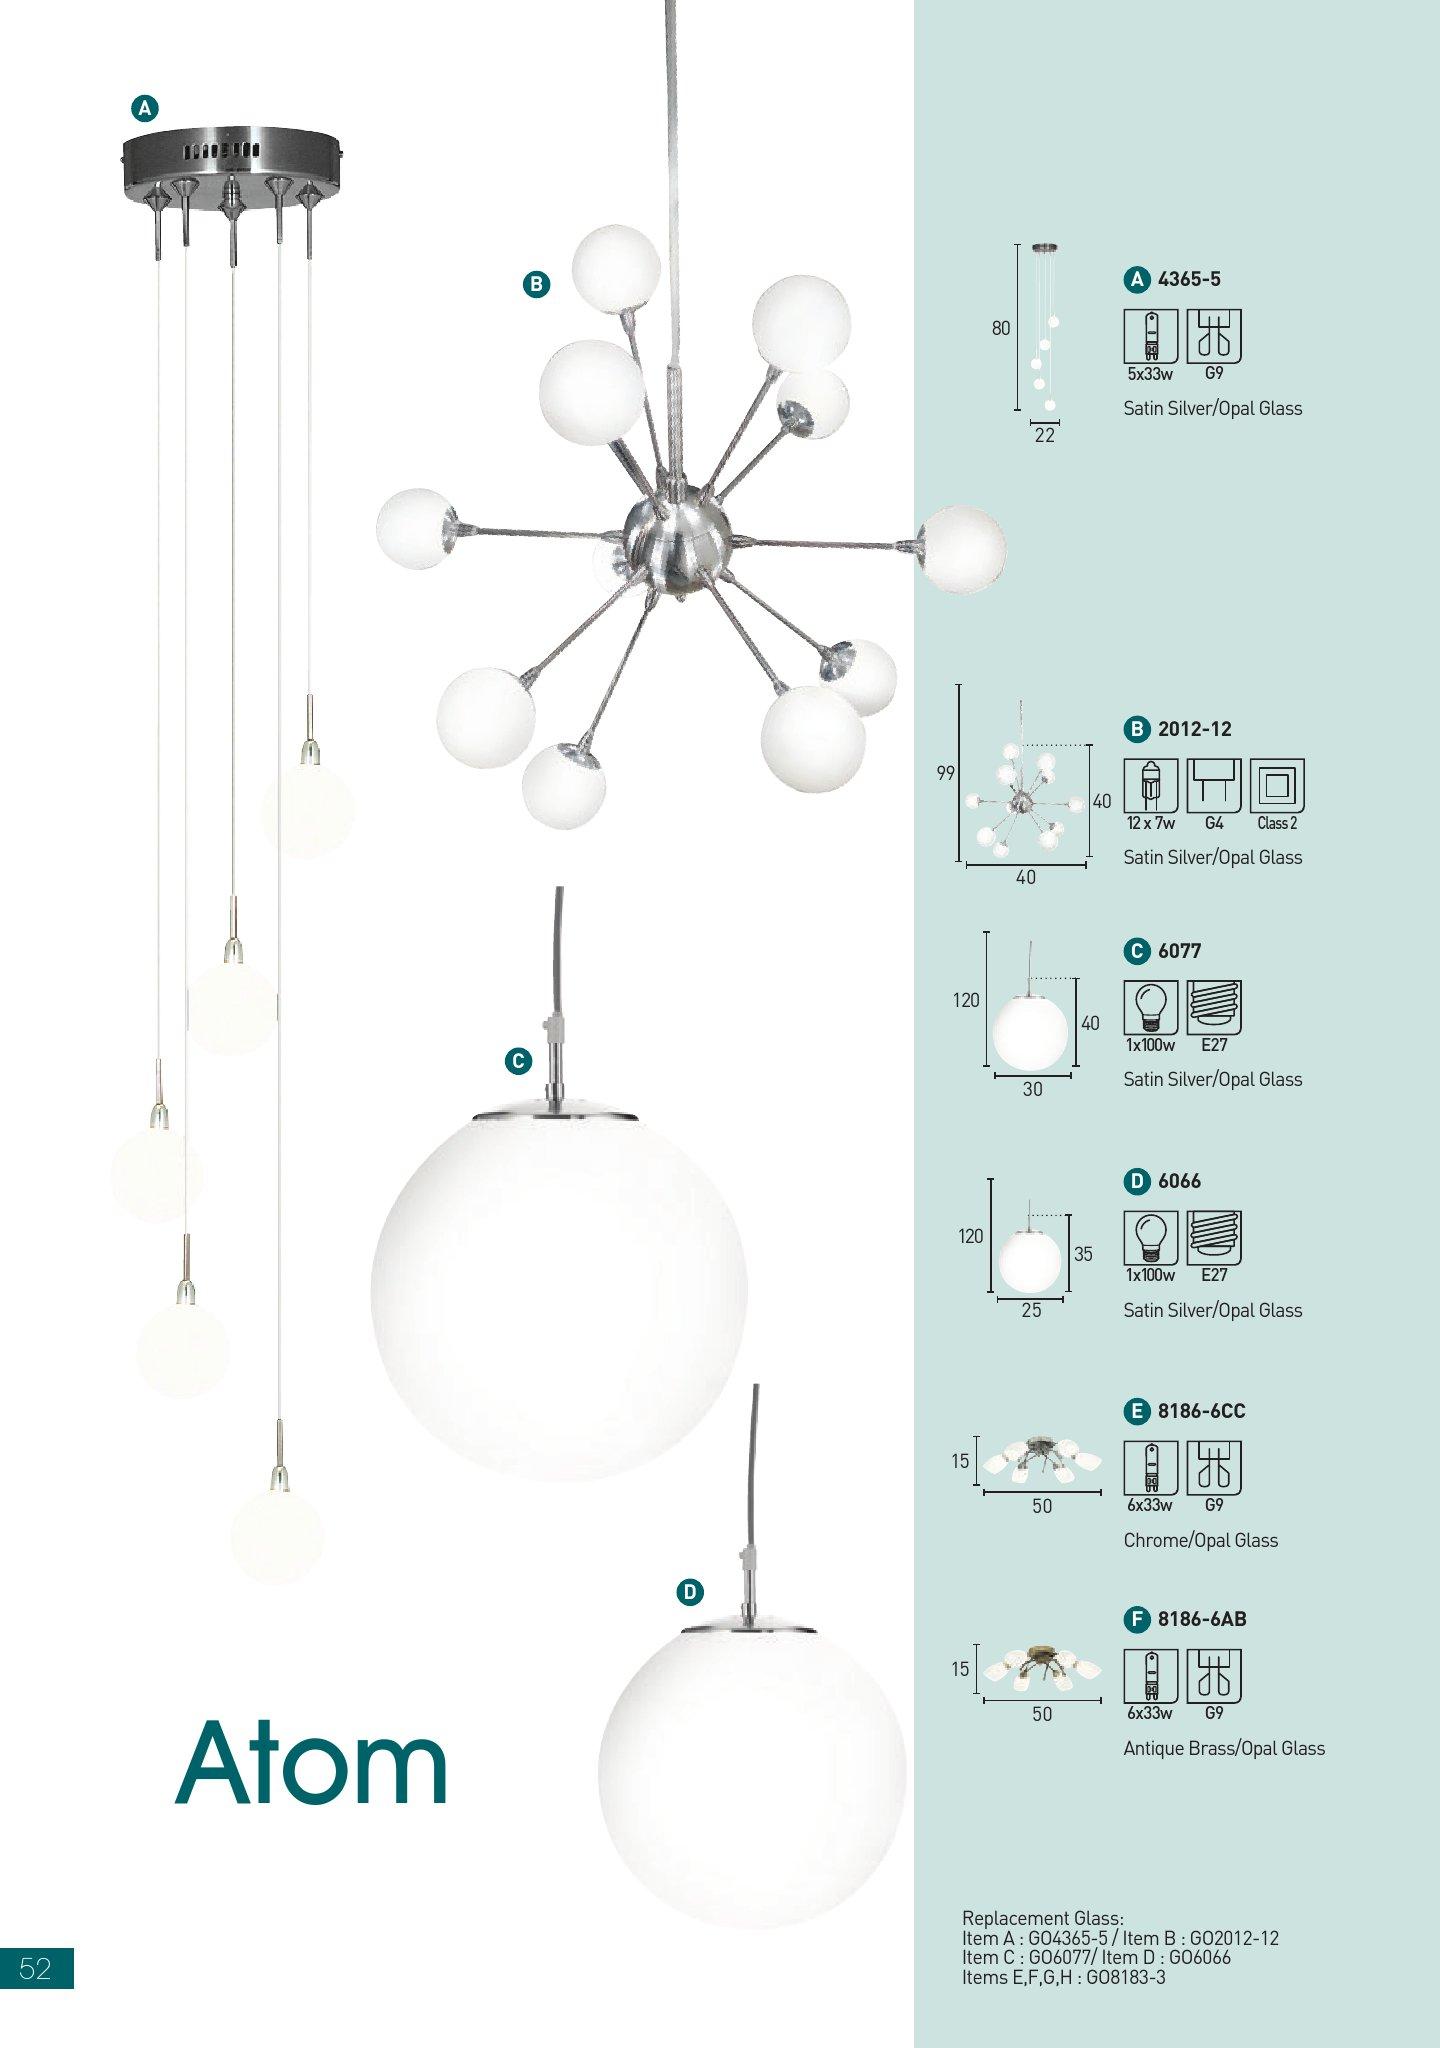 Atom Lámpara Colgante ø25 1xE27 100w Plata